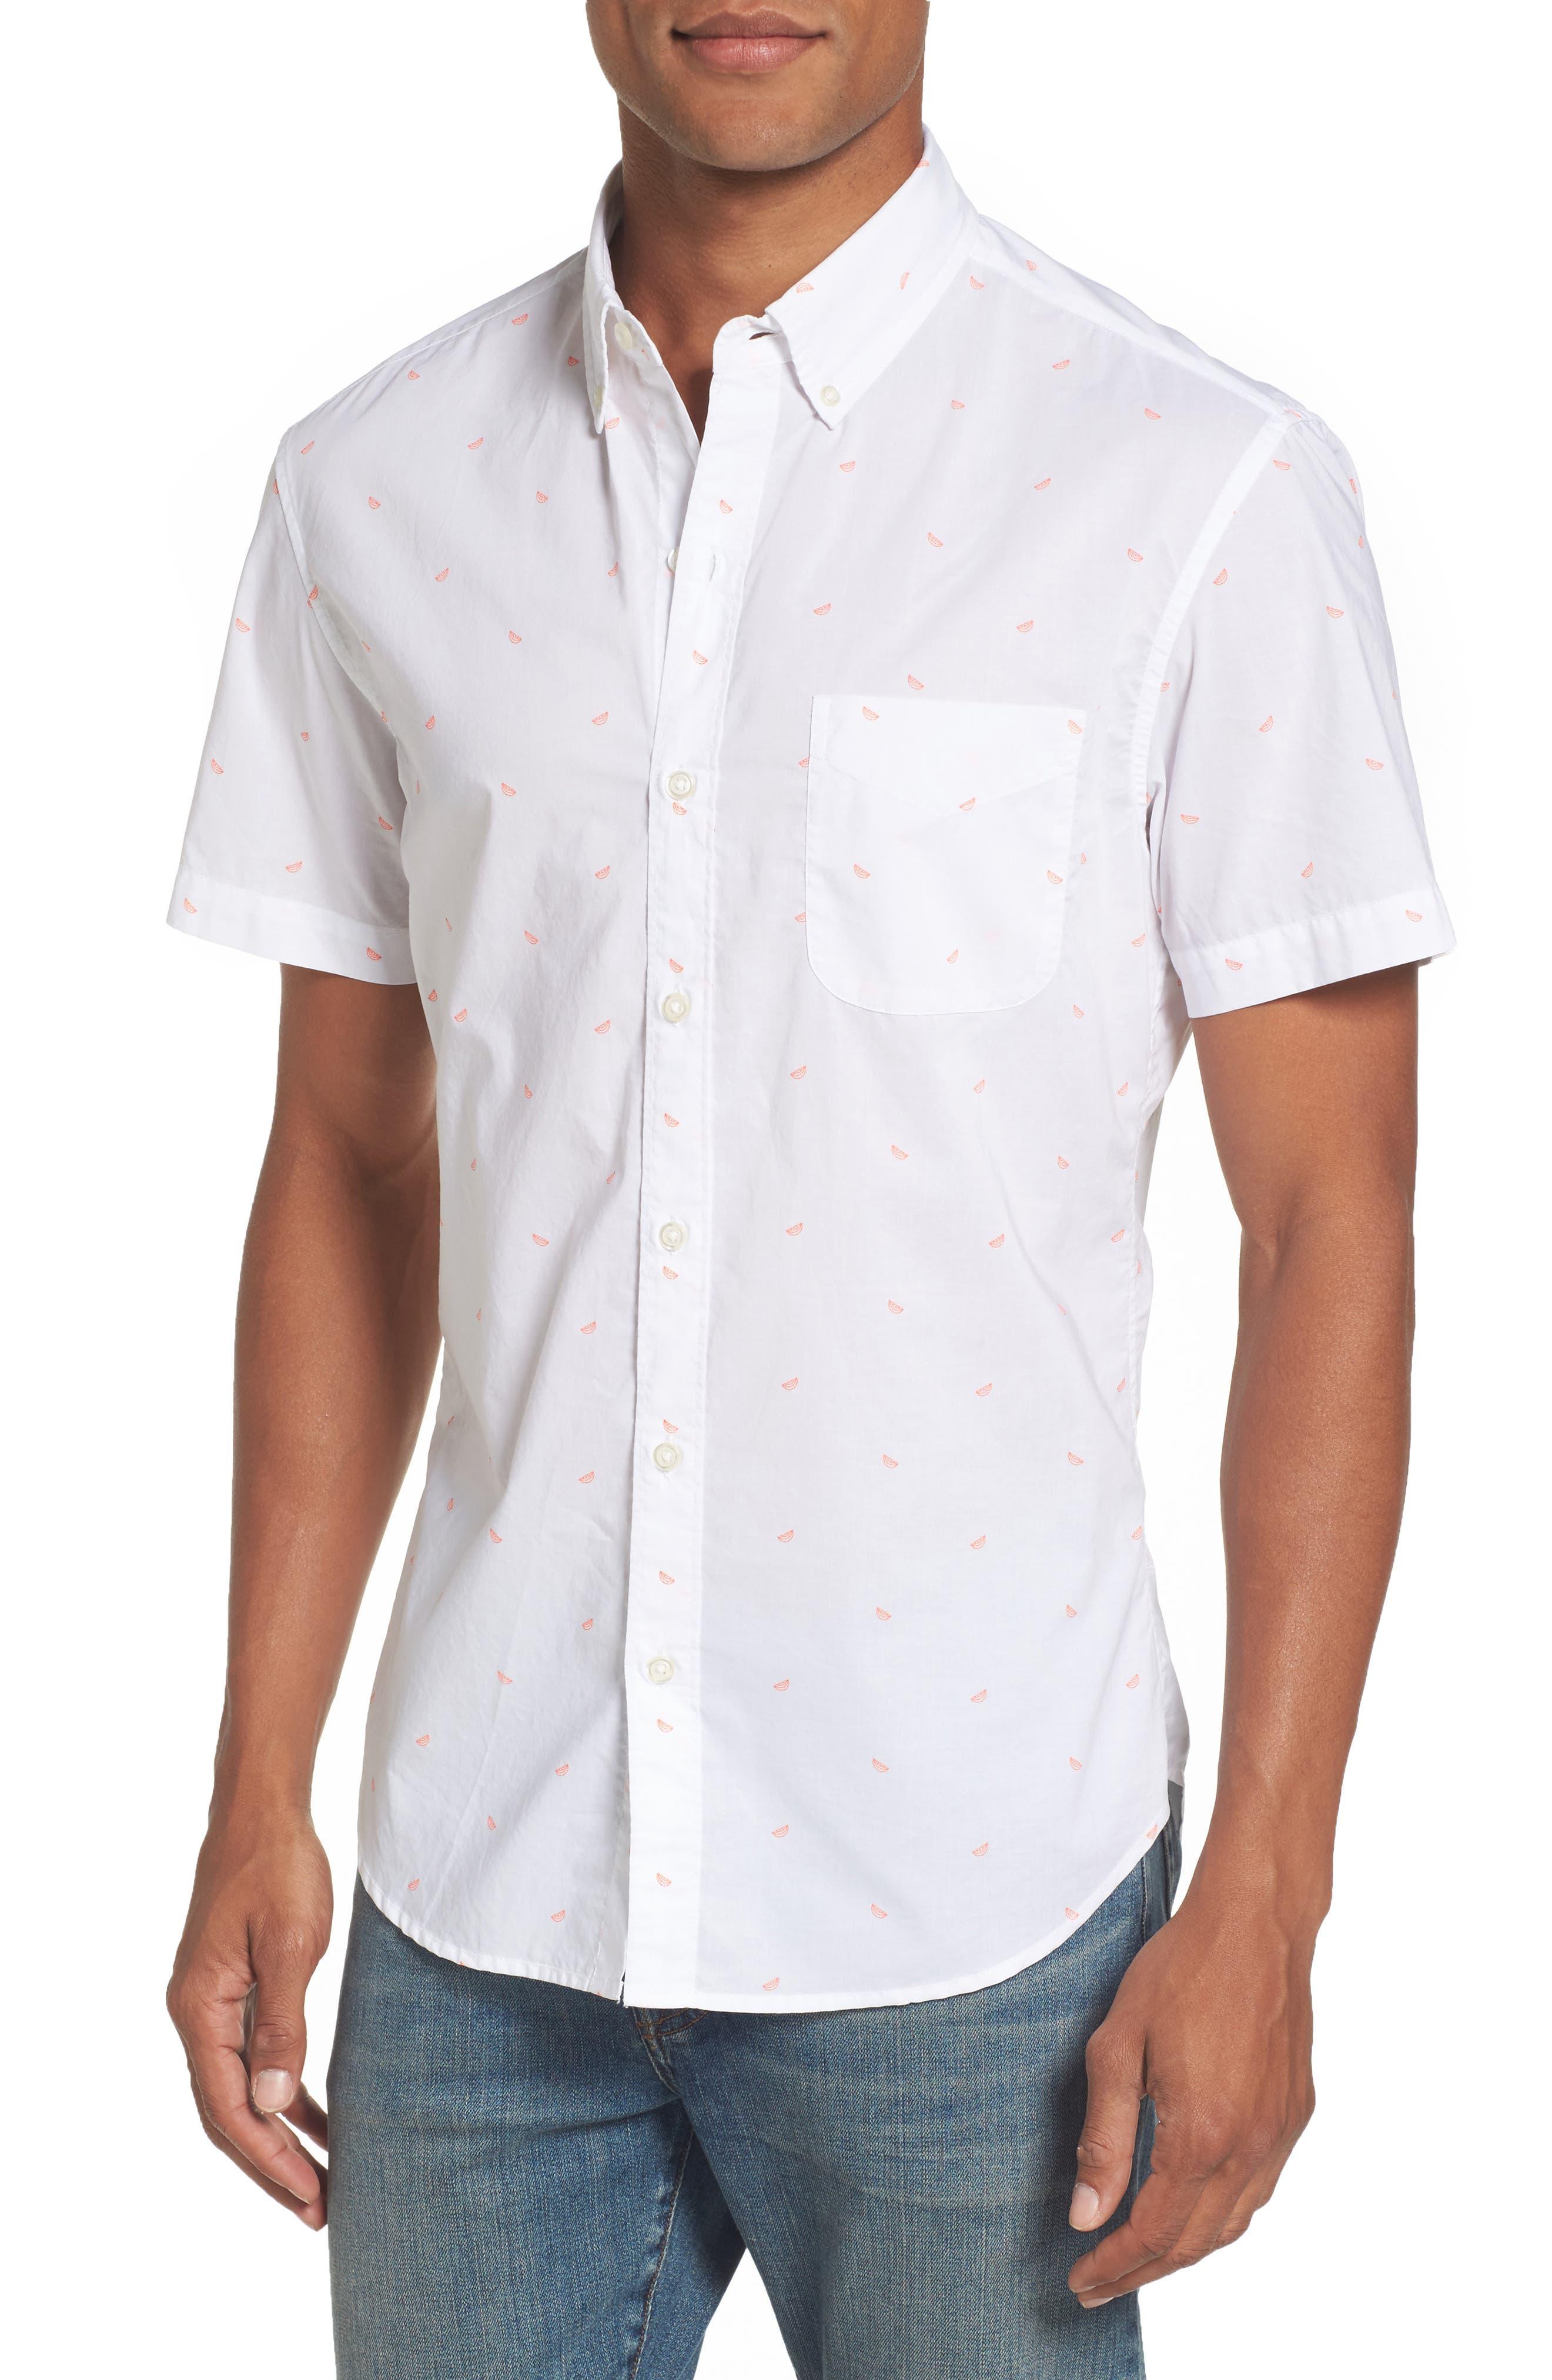 Main Image - Bonobos Riviera Slim Cut Citrus Woven Shirt